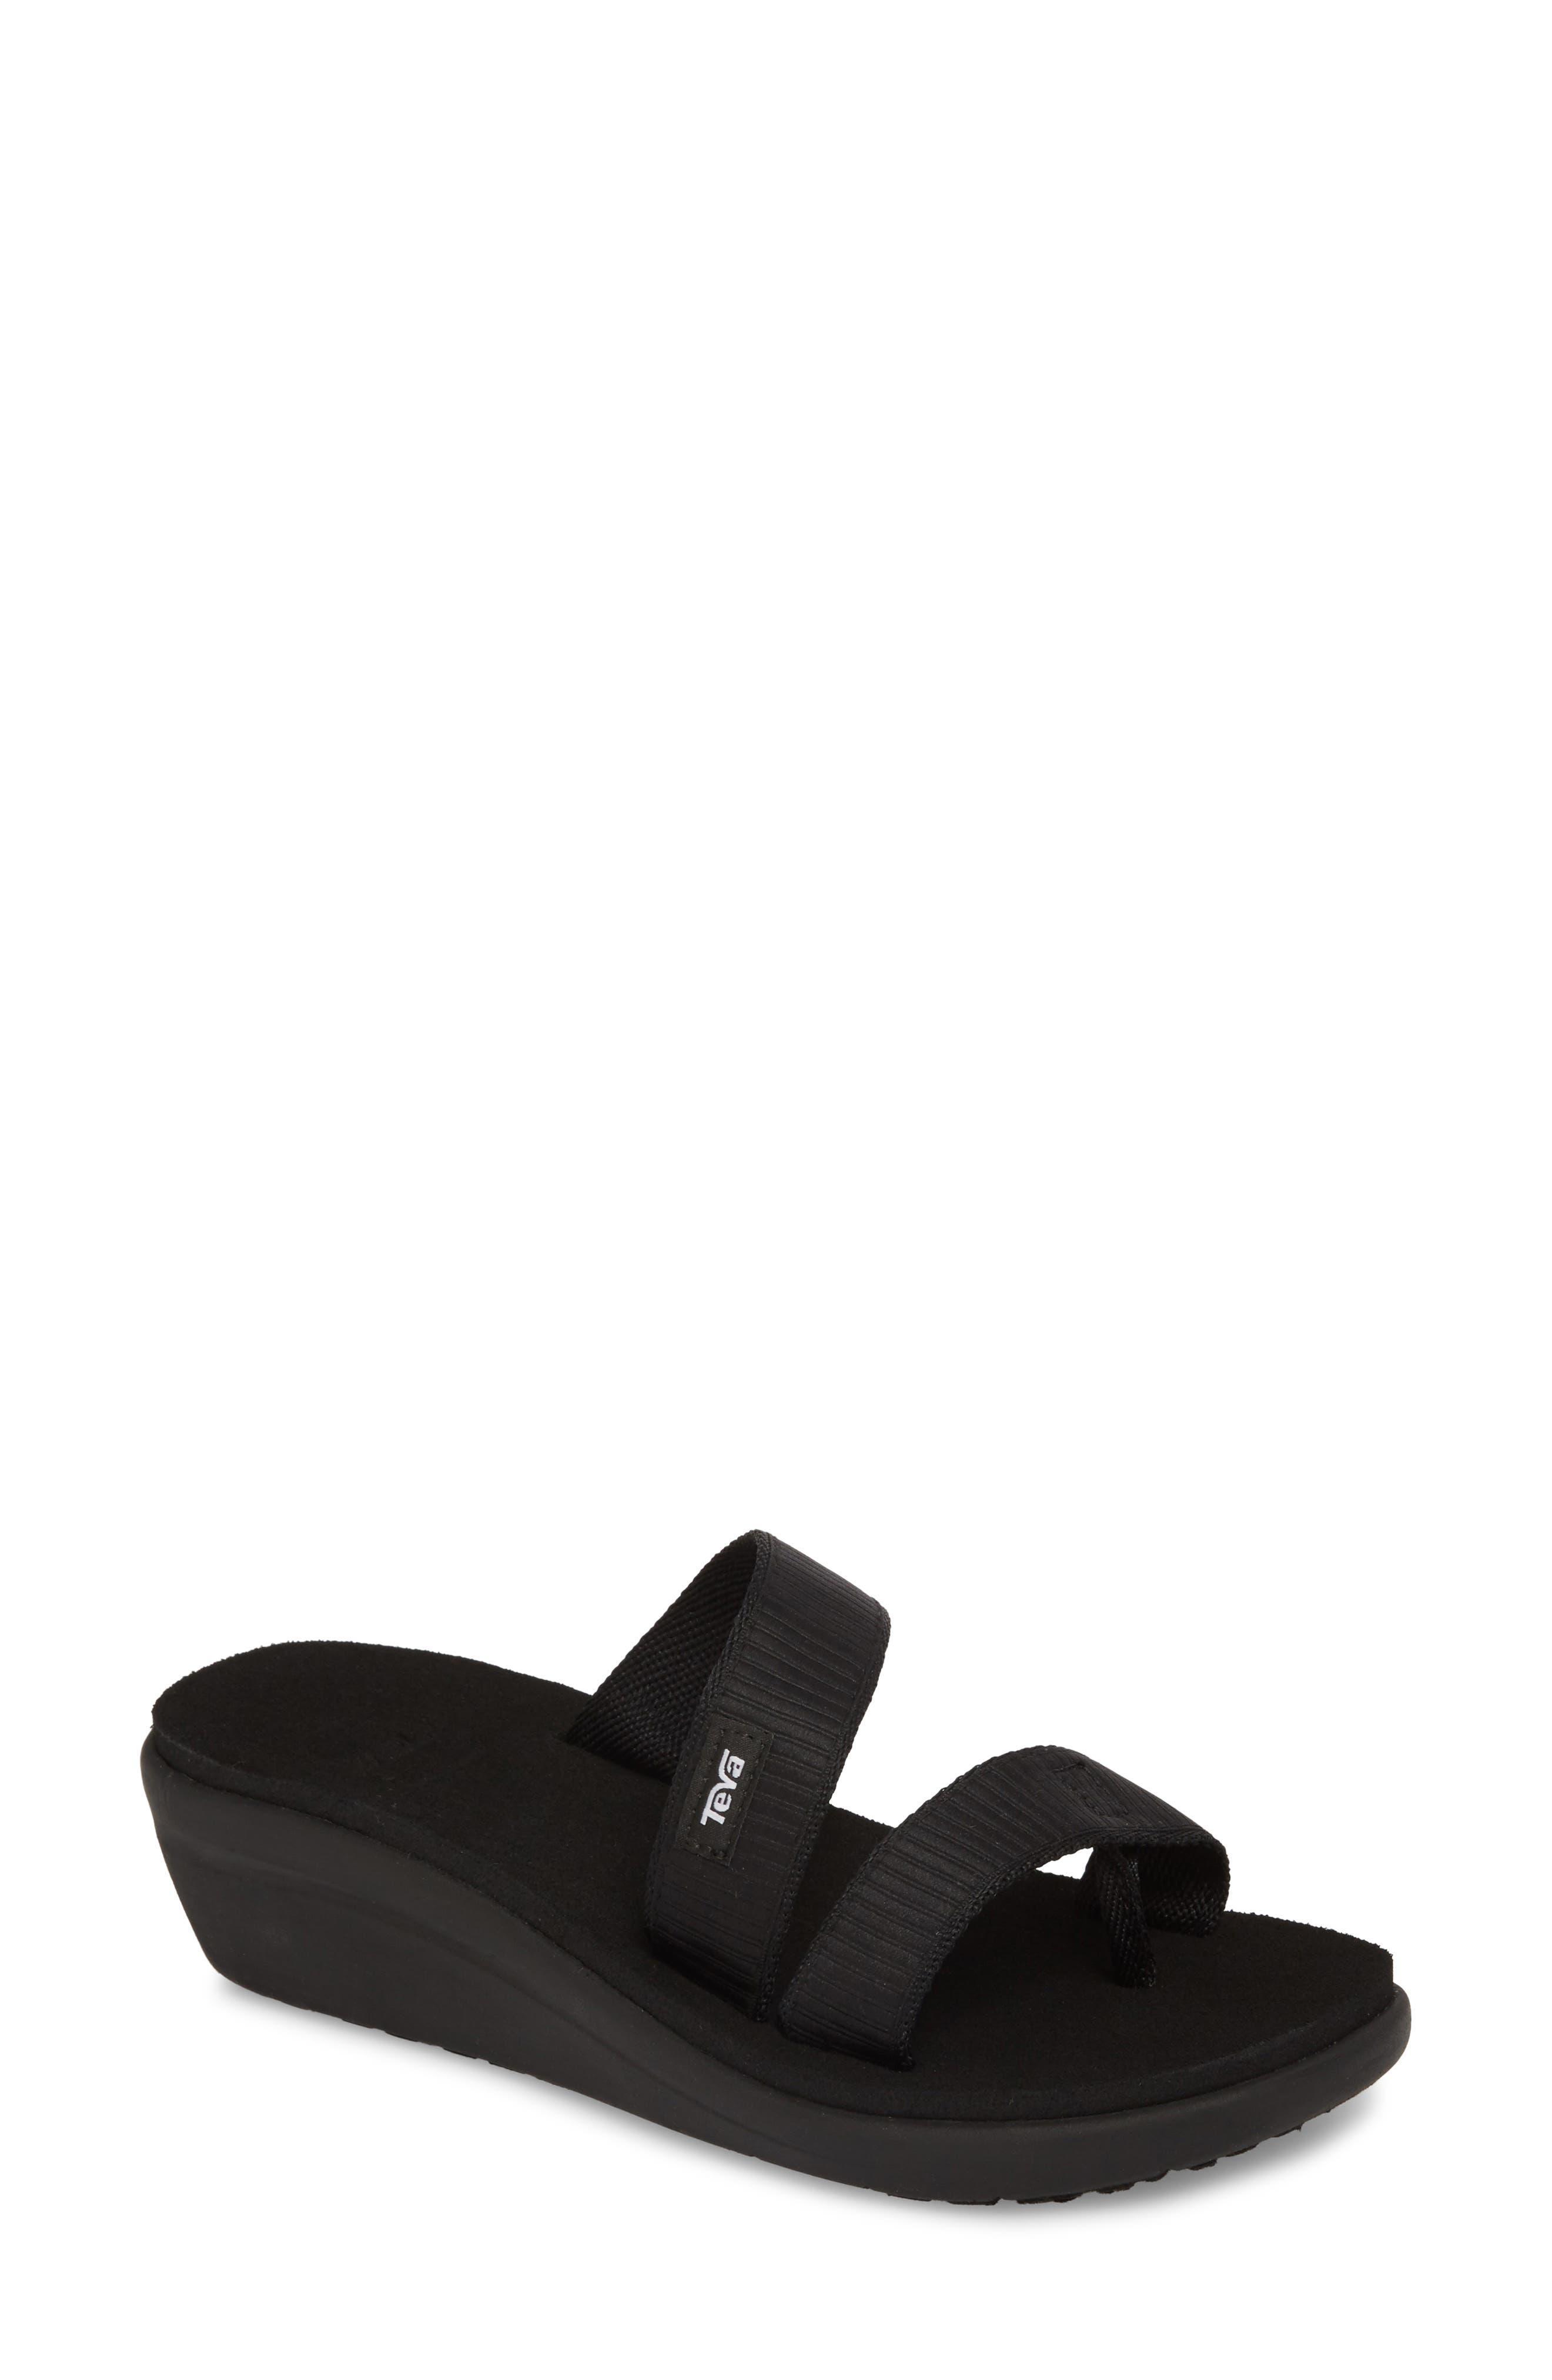 Voya Loma Wedge Sandal,                         Main,                         color, Livy Black